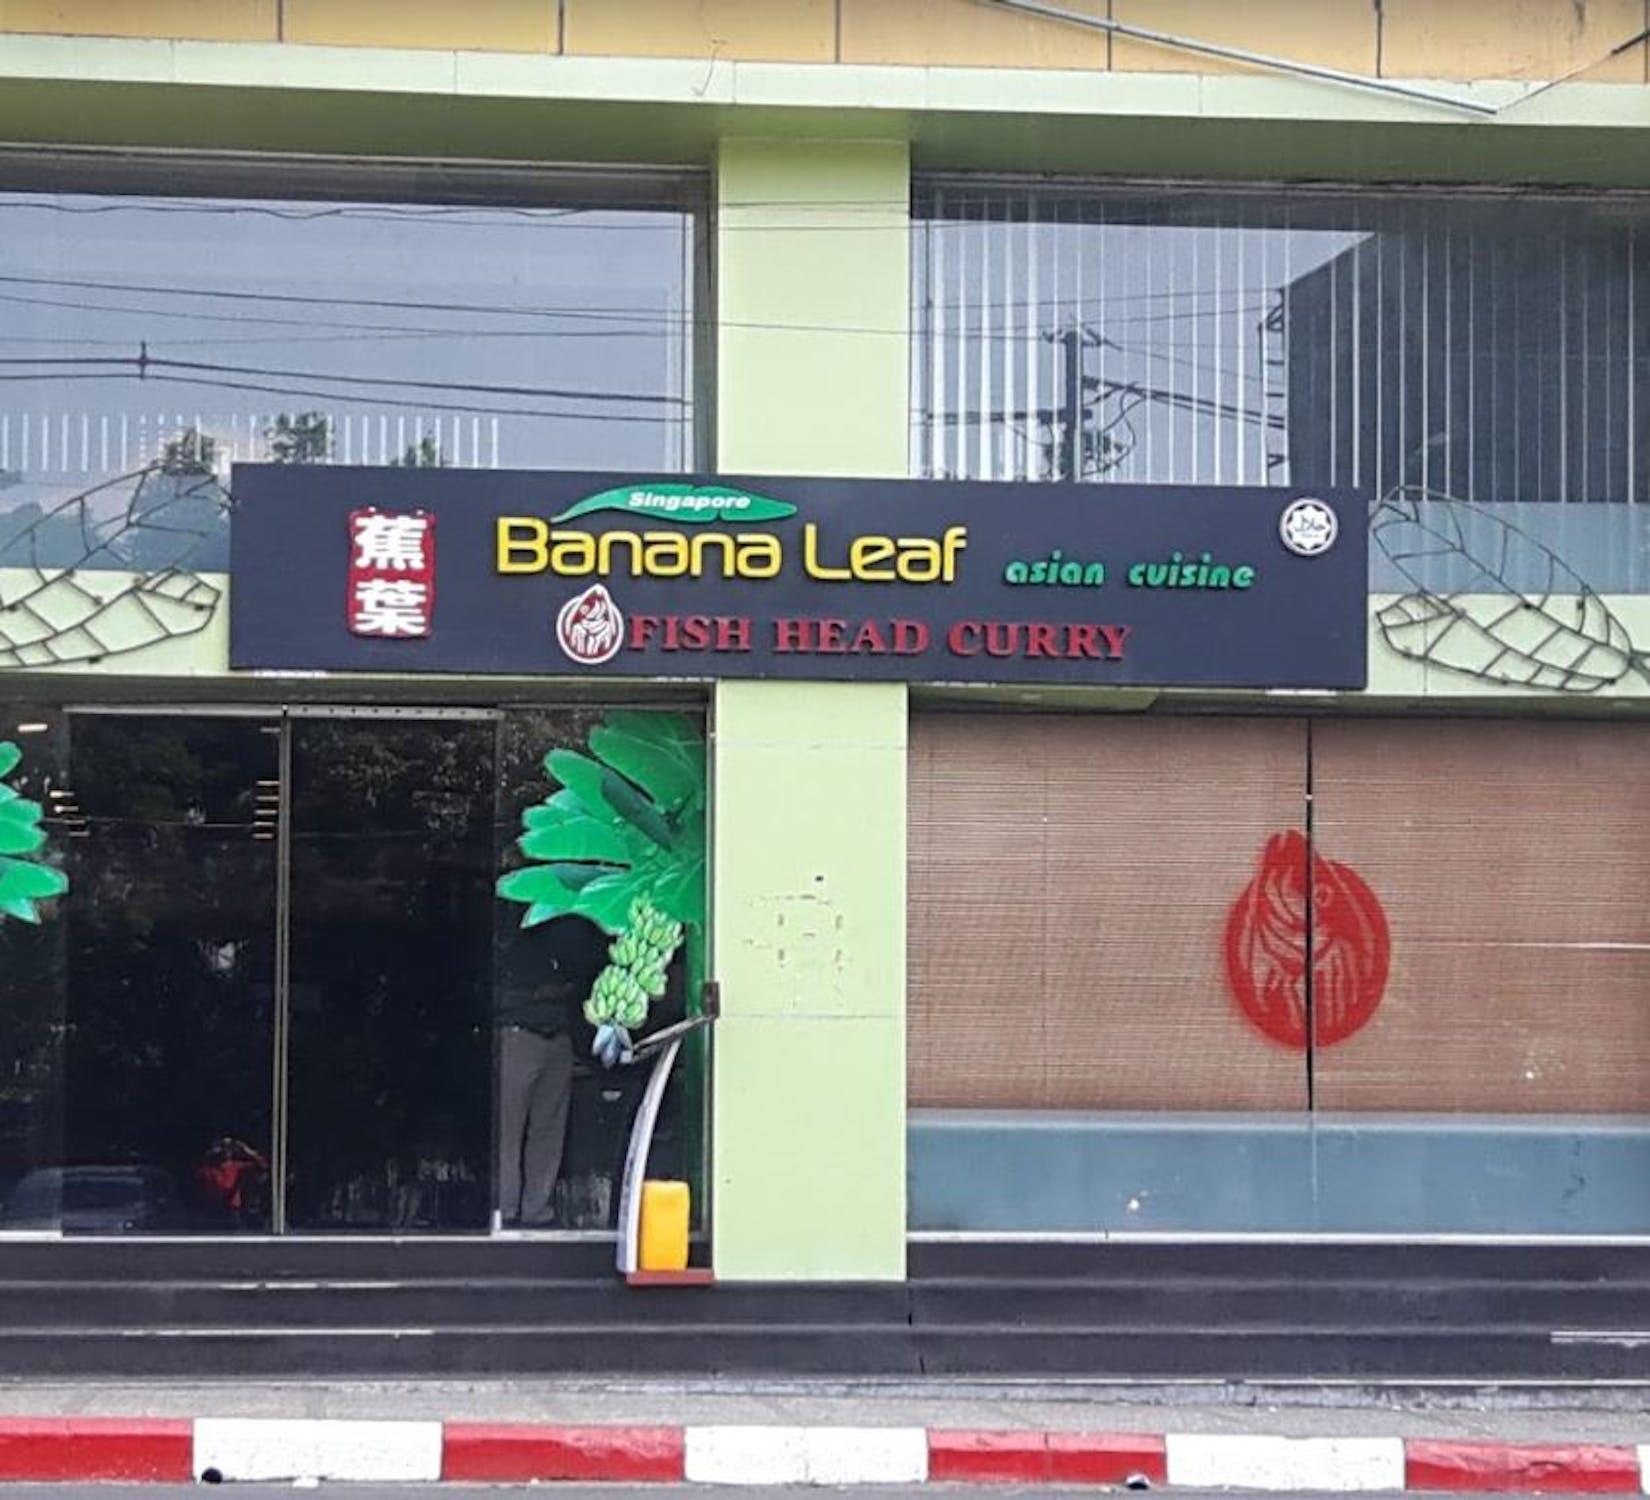 Banana Leaf Fish Head Curry Resturant | yathar